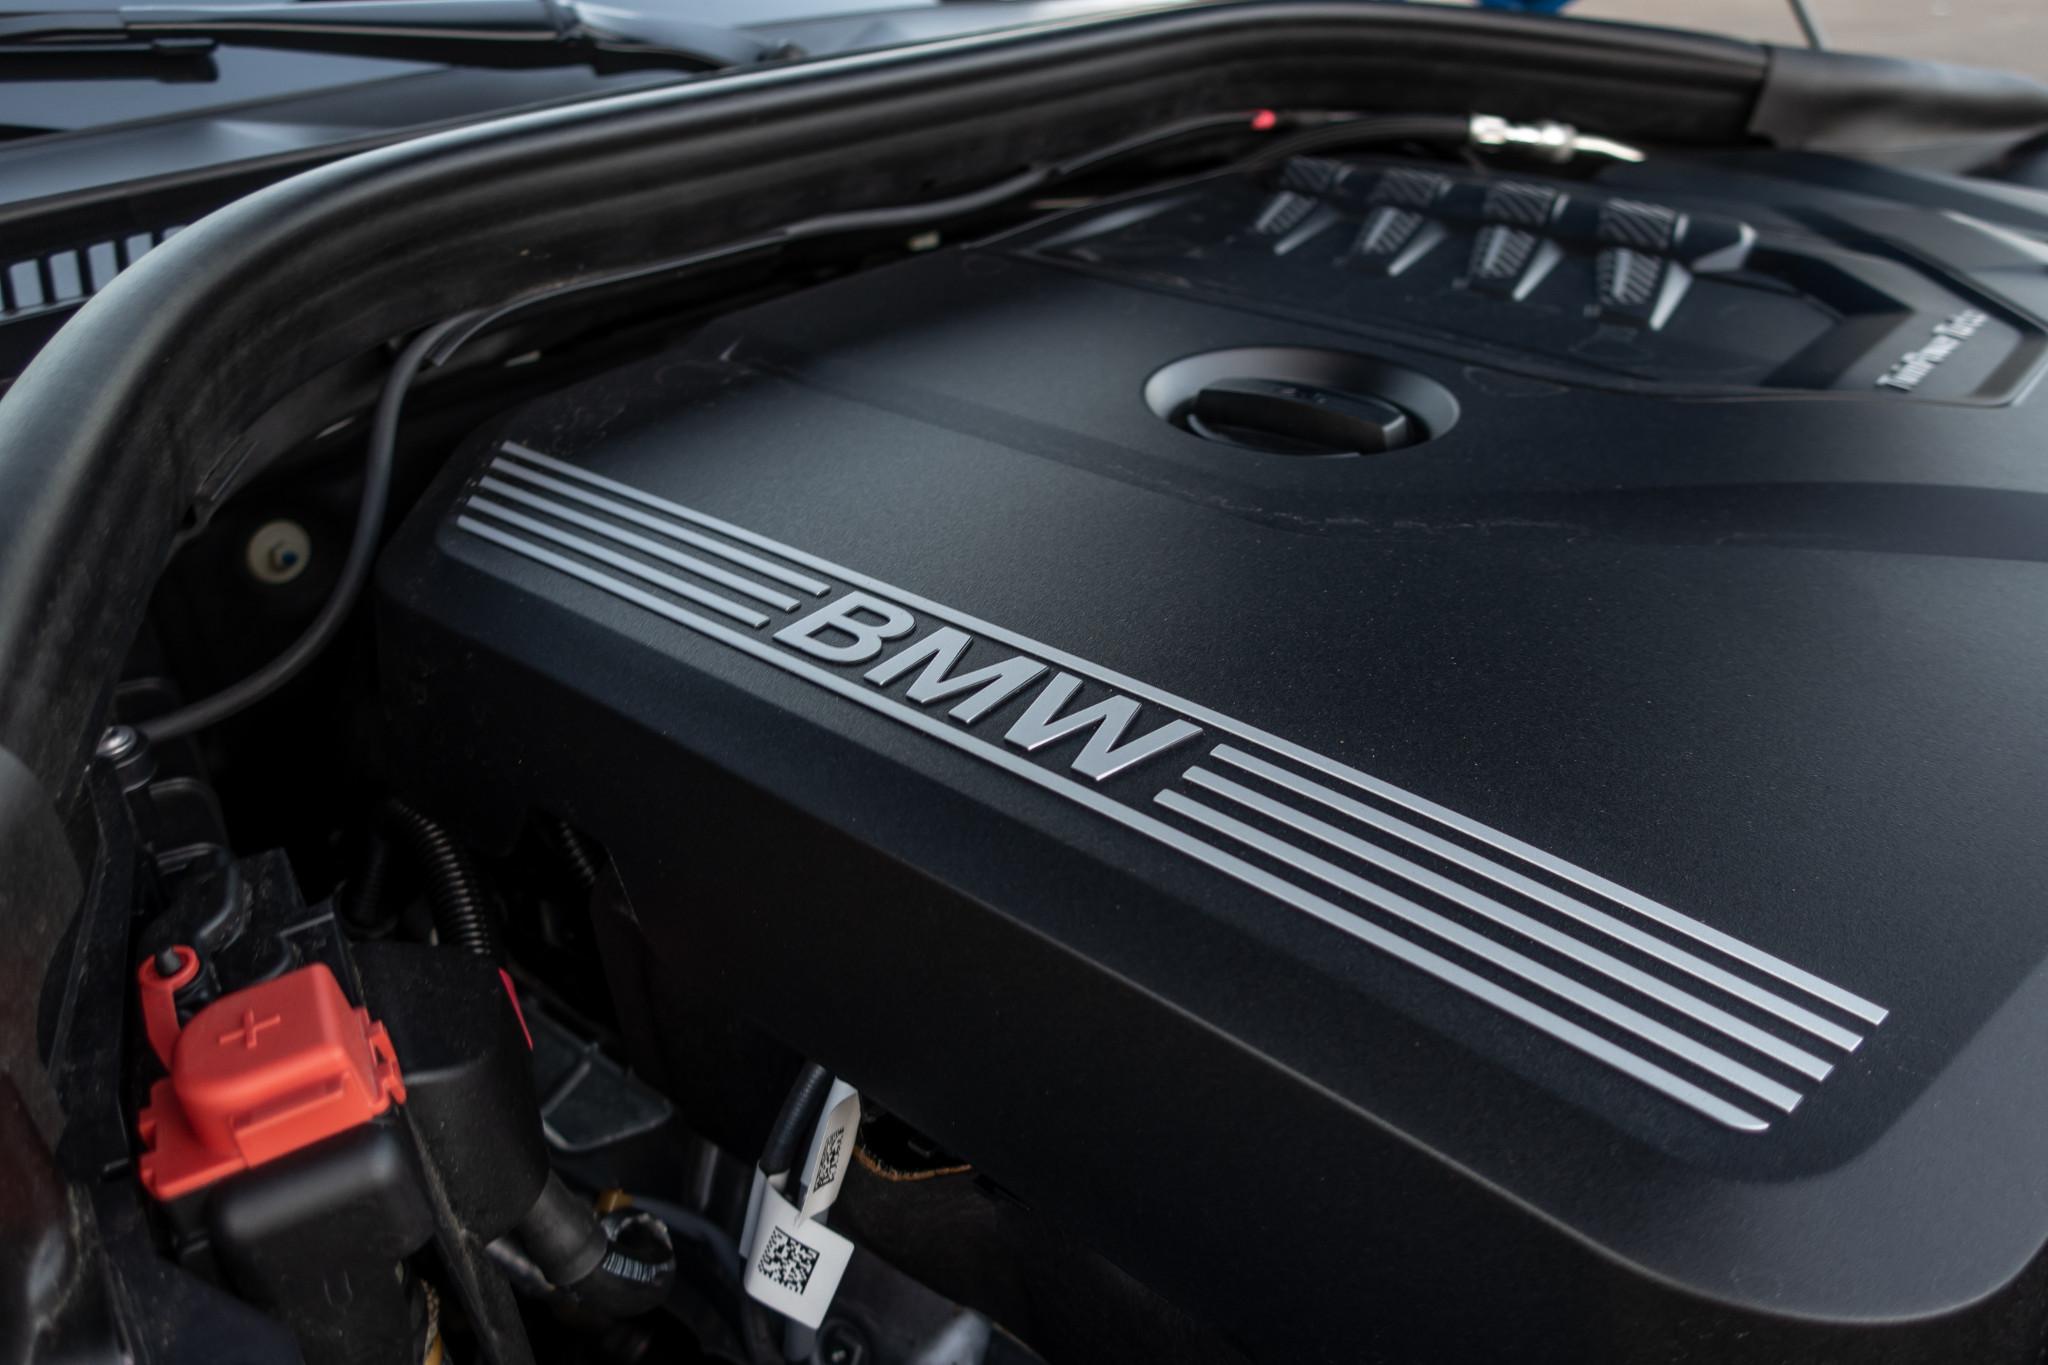 bmw-z4-30i-sdrive-2020-14-detail--engine--exterior.jpg